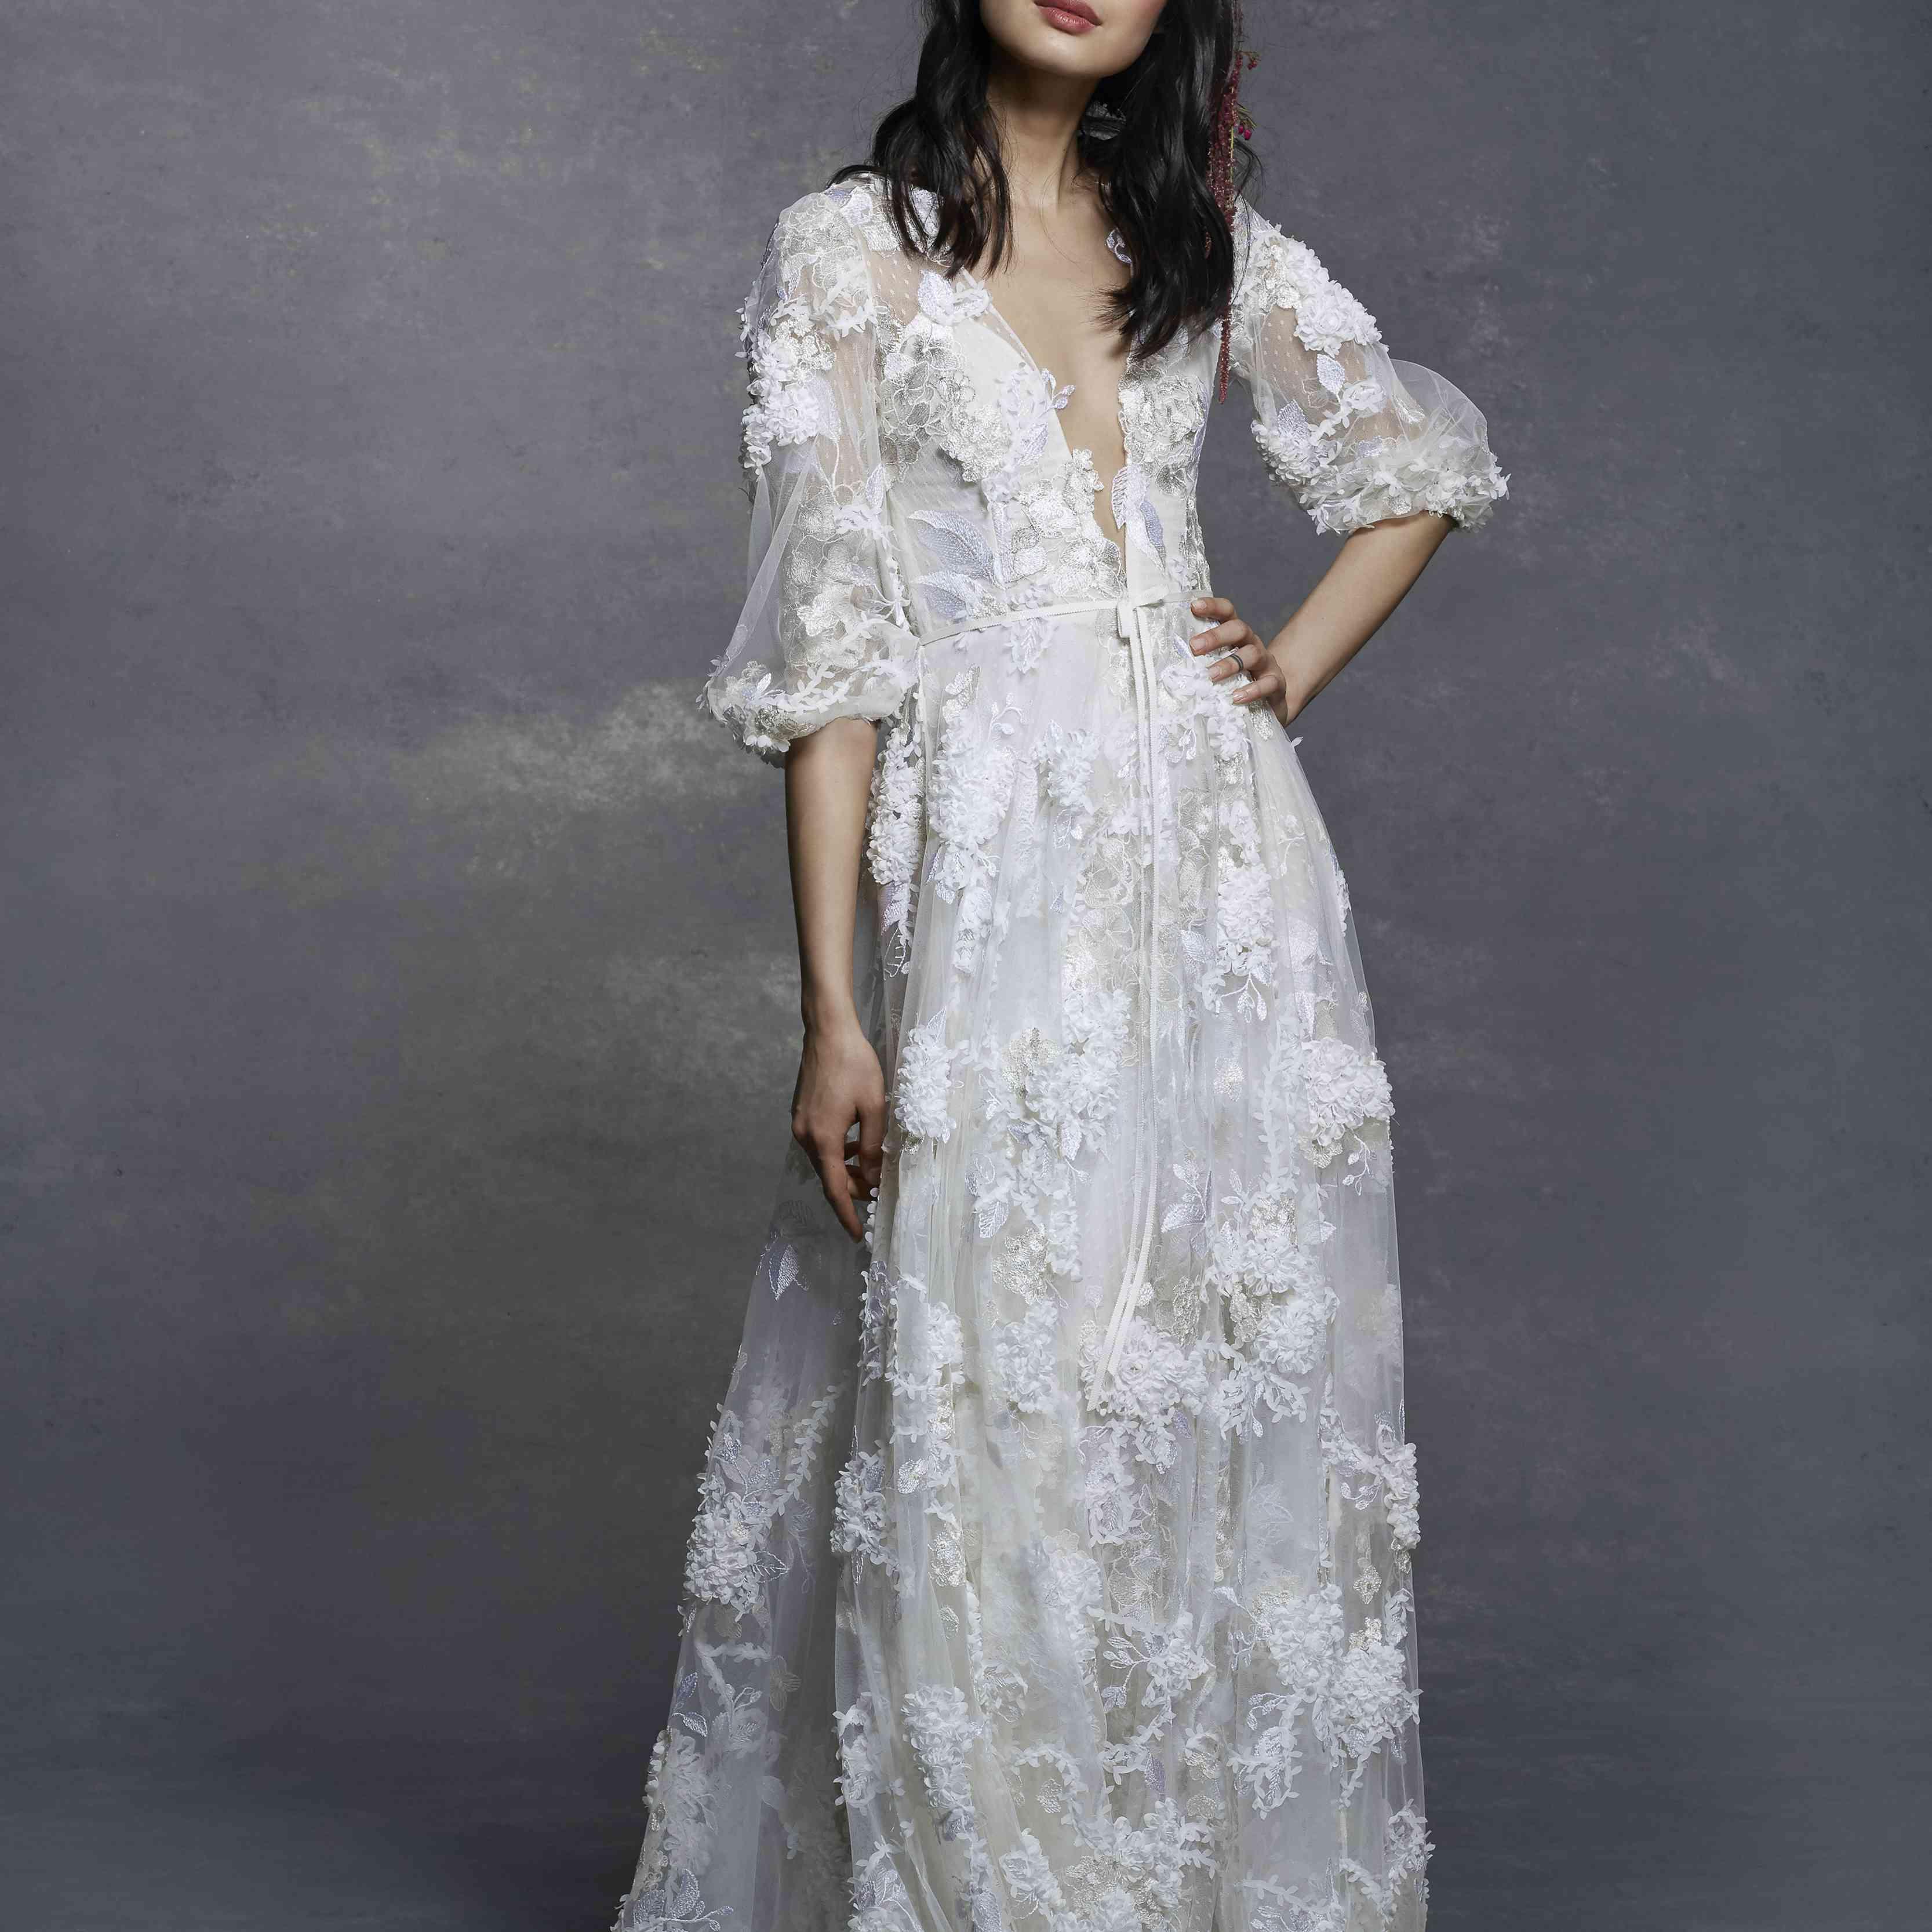 Gallery New Mira Zwillinger Wedding Dresses Spring 2019: Marchesa Notte Bridal Spring 2019